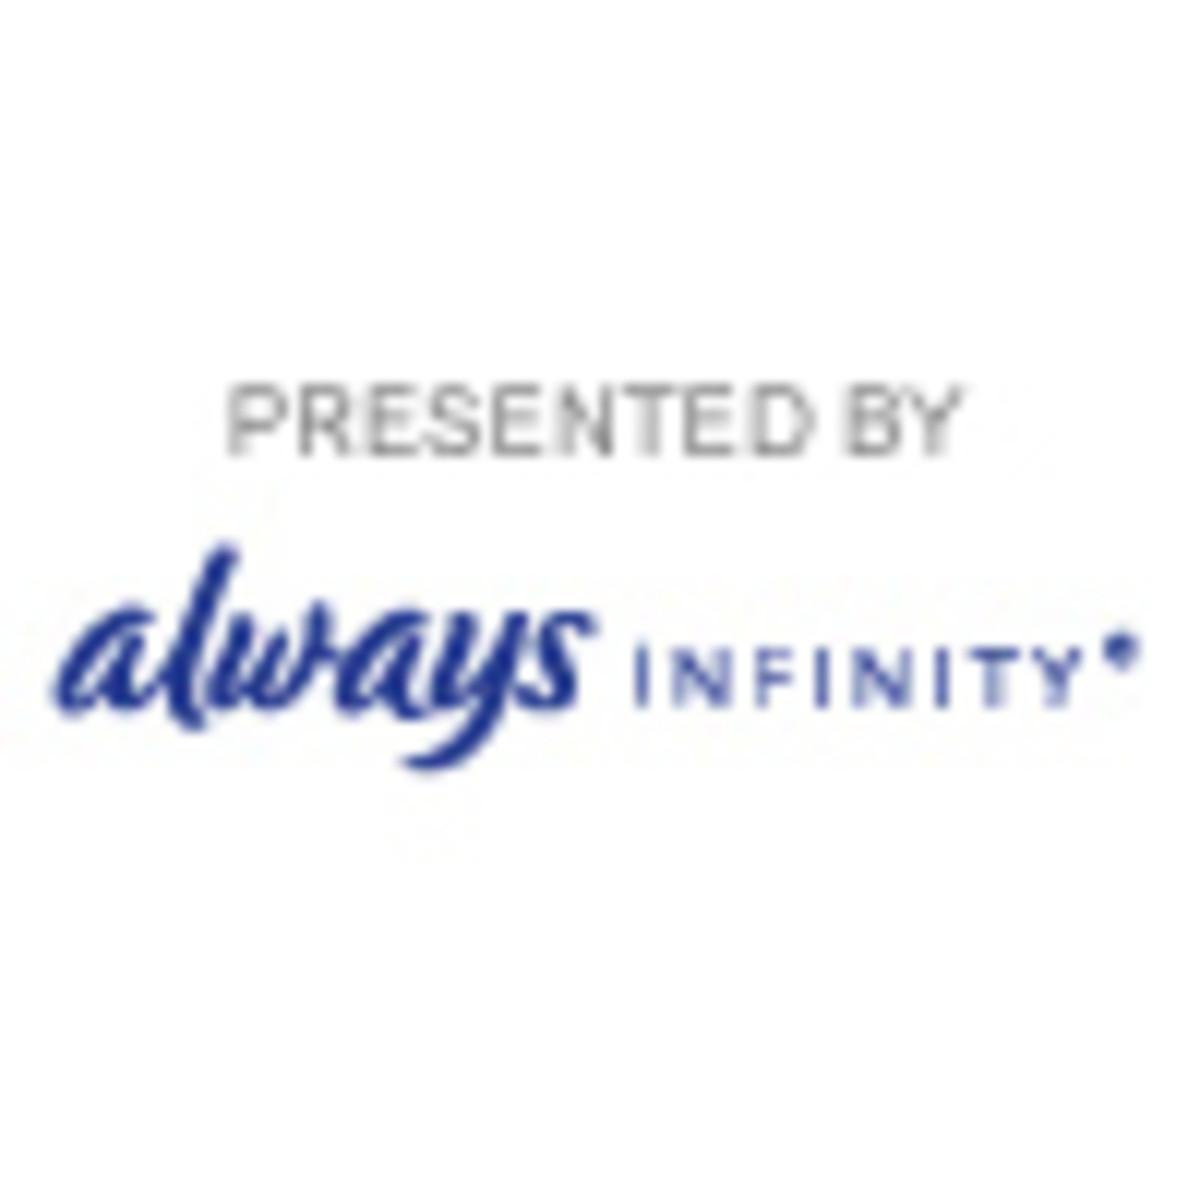 always infiniti